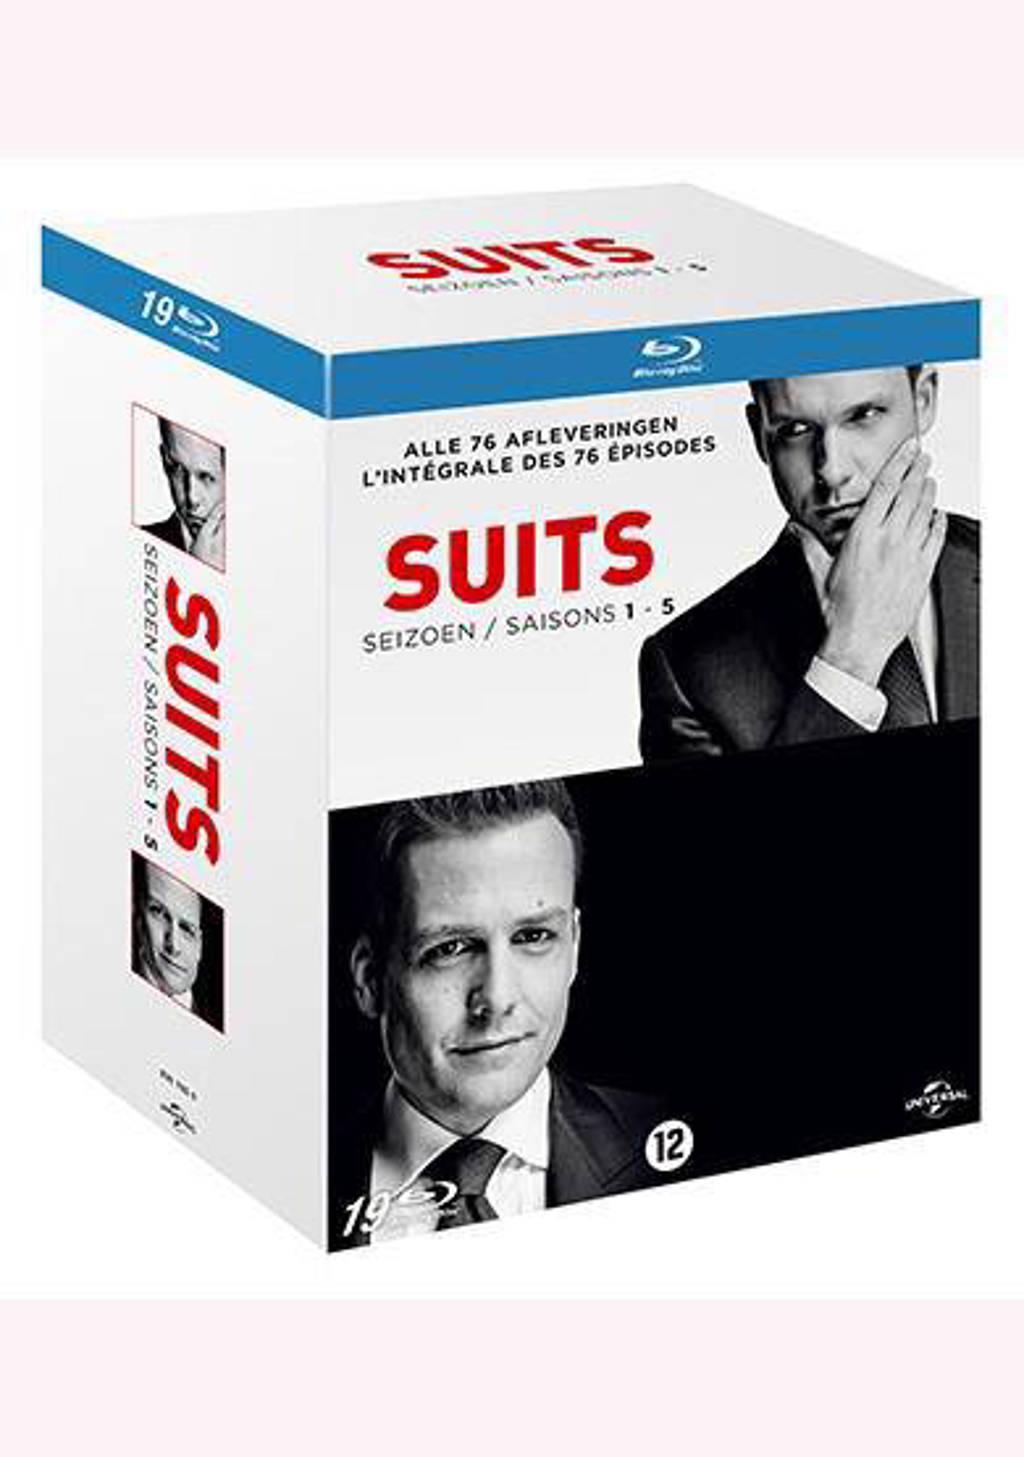 Suits - Seizoen 1-5 (Blu-ray)